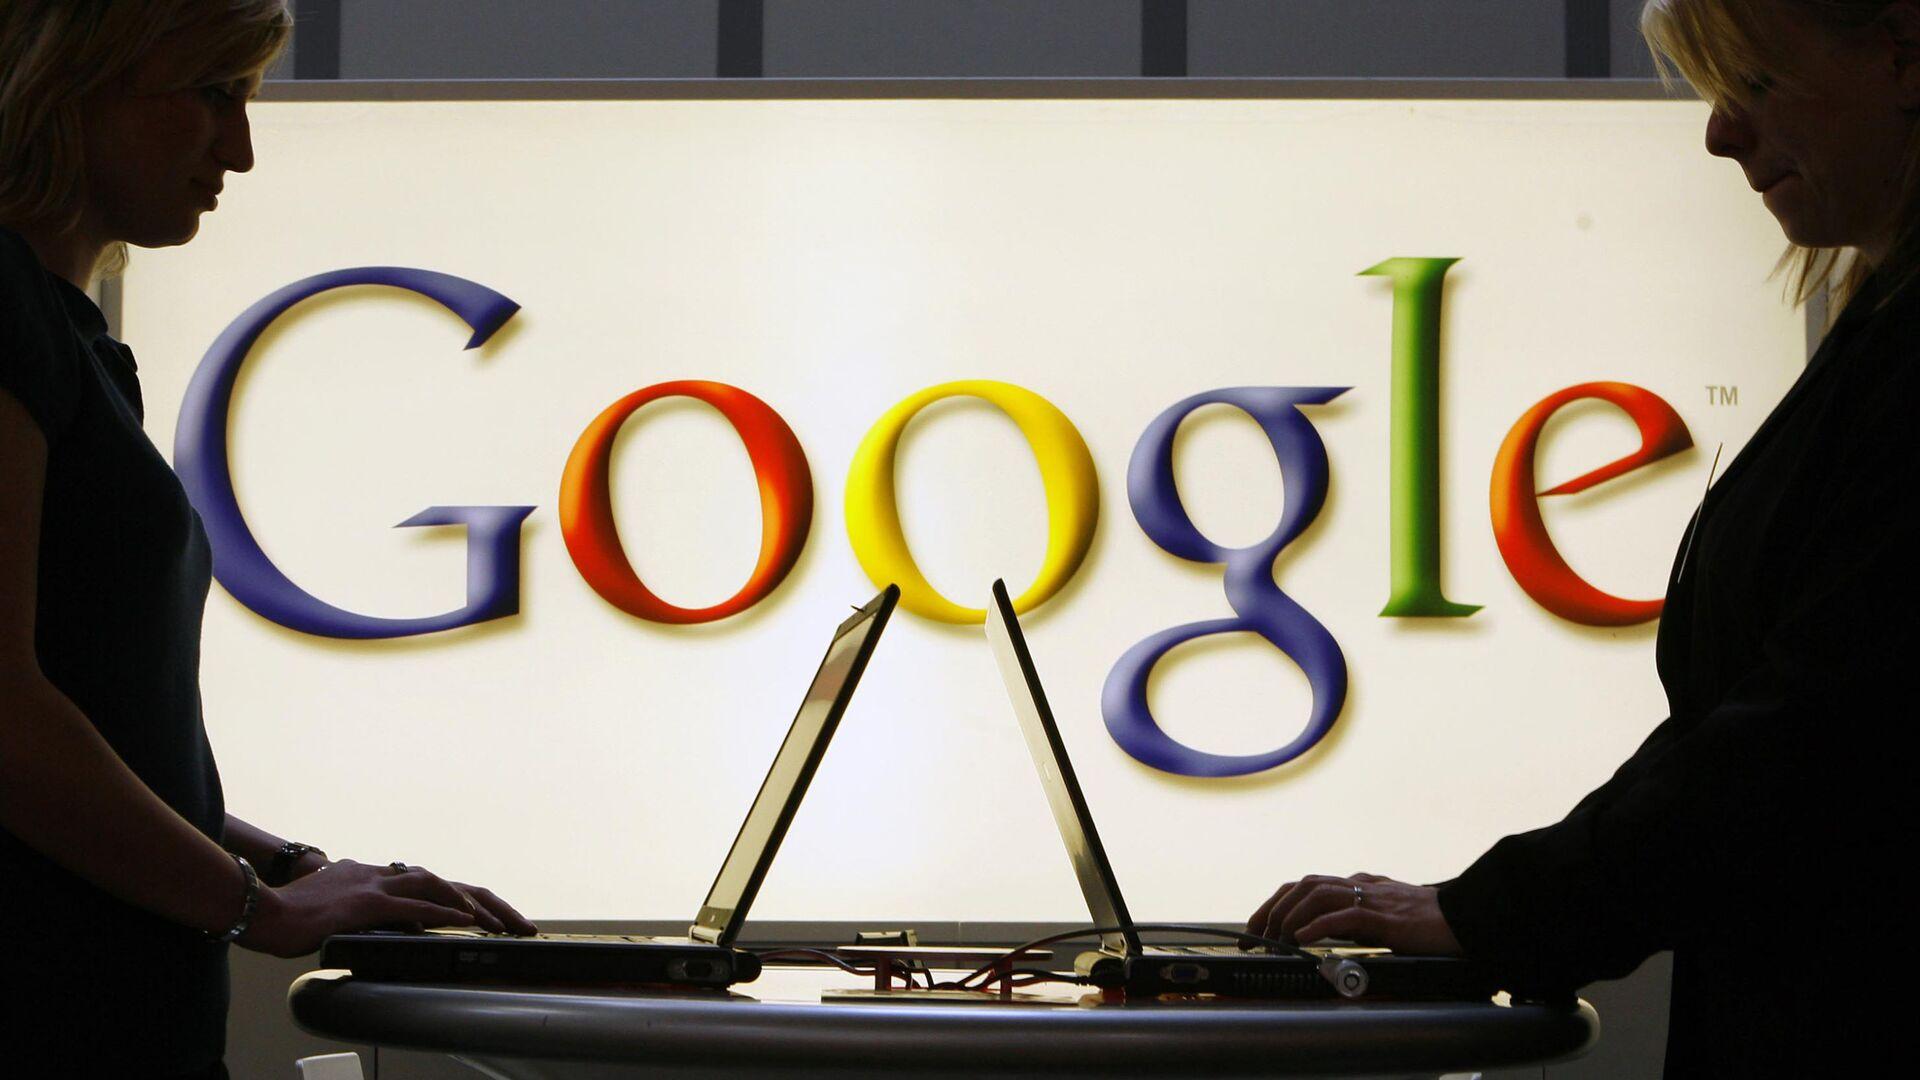 Логотип компании Google - РИА Новости, 1920, 23.11.2020